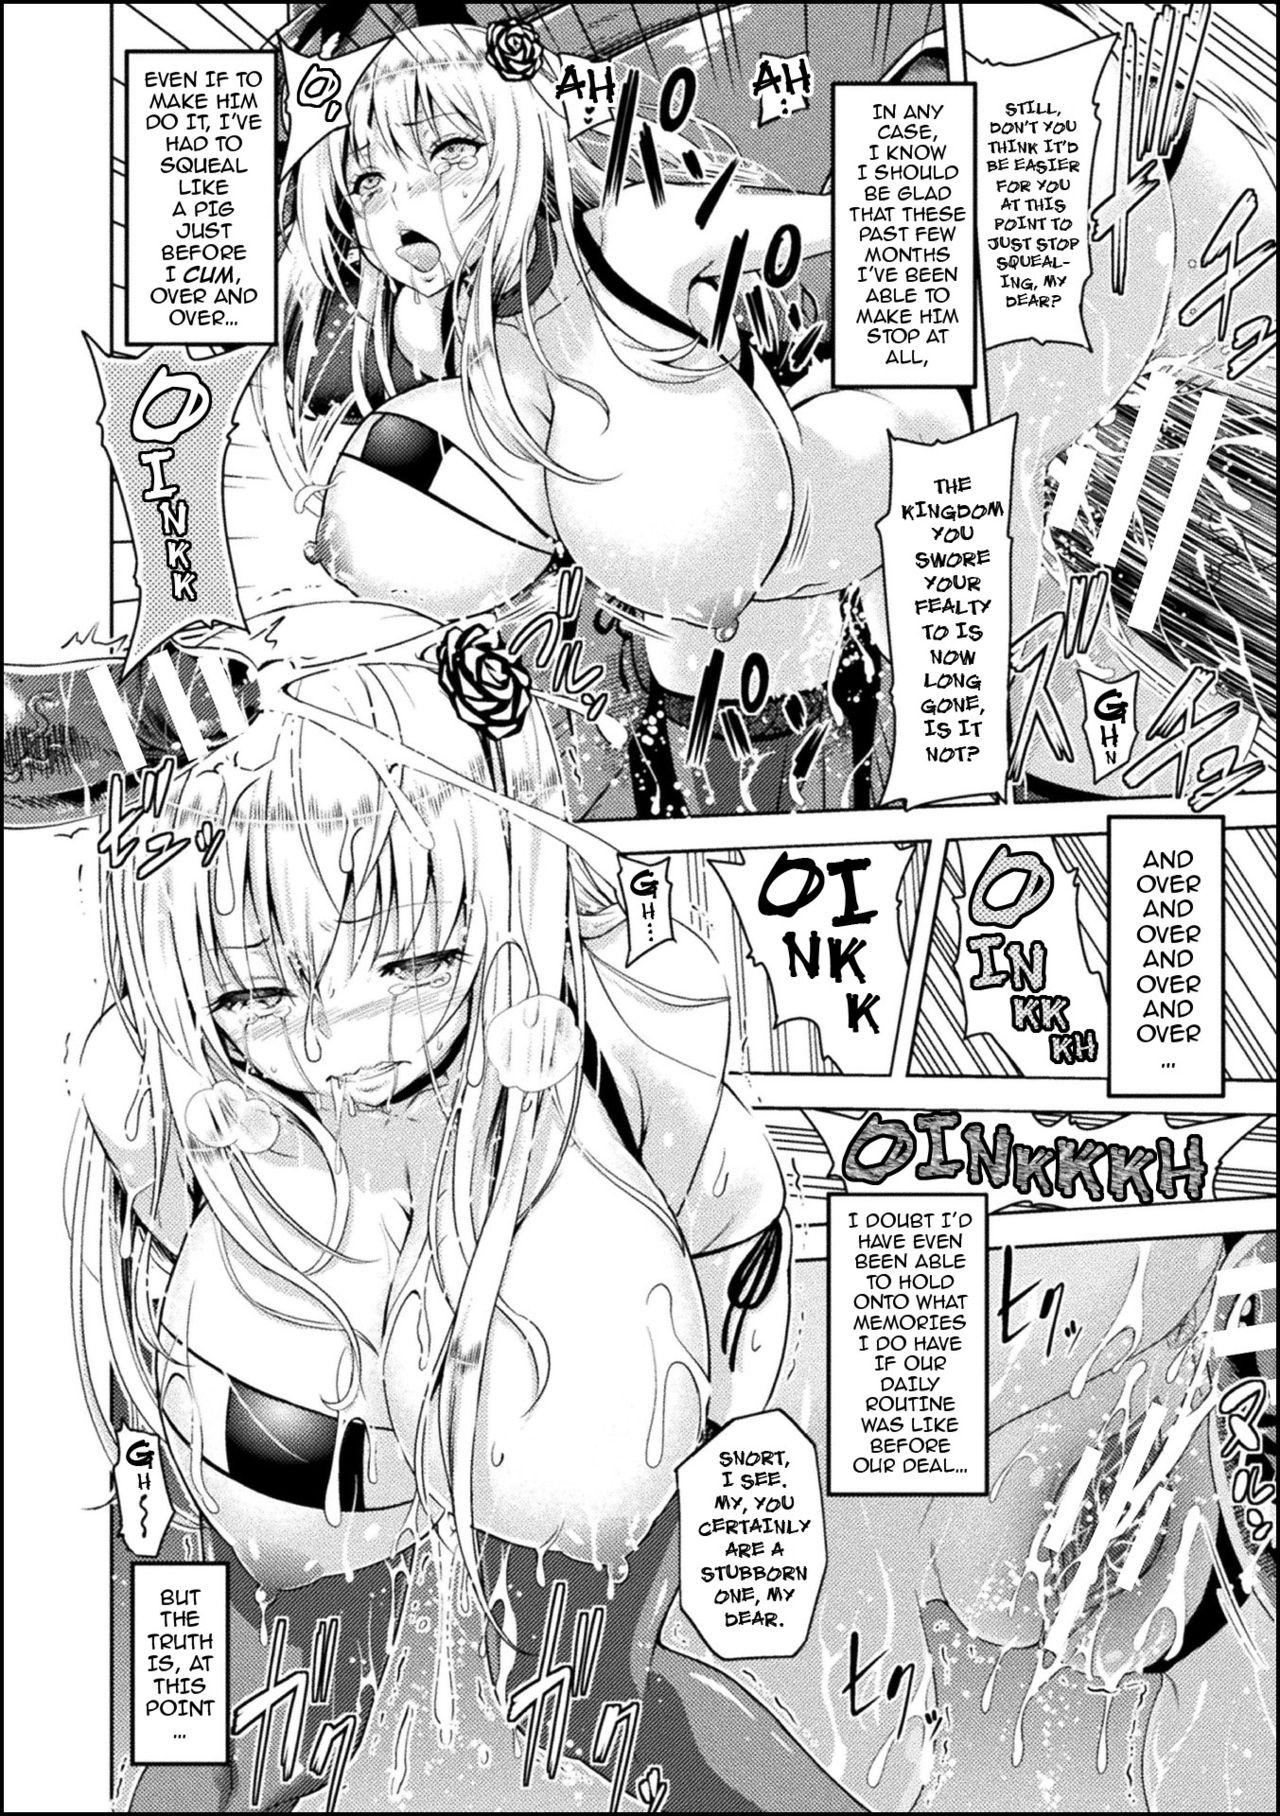 [Yamada Gogogo] Erona ~Orc no Inmon ni Okasareta Onna Kishi no Matsuro~ | Erona ~The Fall of a Beautiful Knight Cursed with the Lewd Mark of an Orc~ [English] {darknight} 54